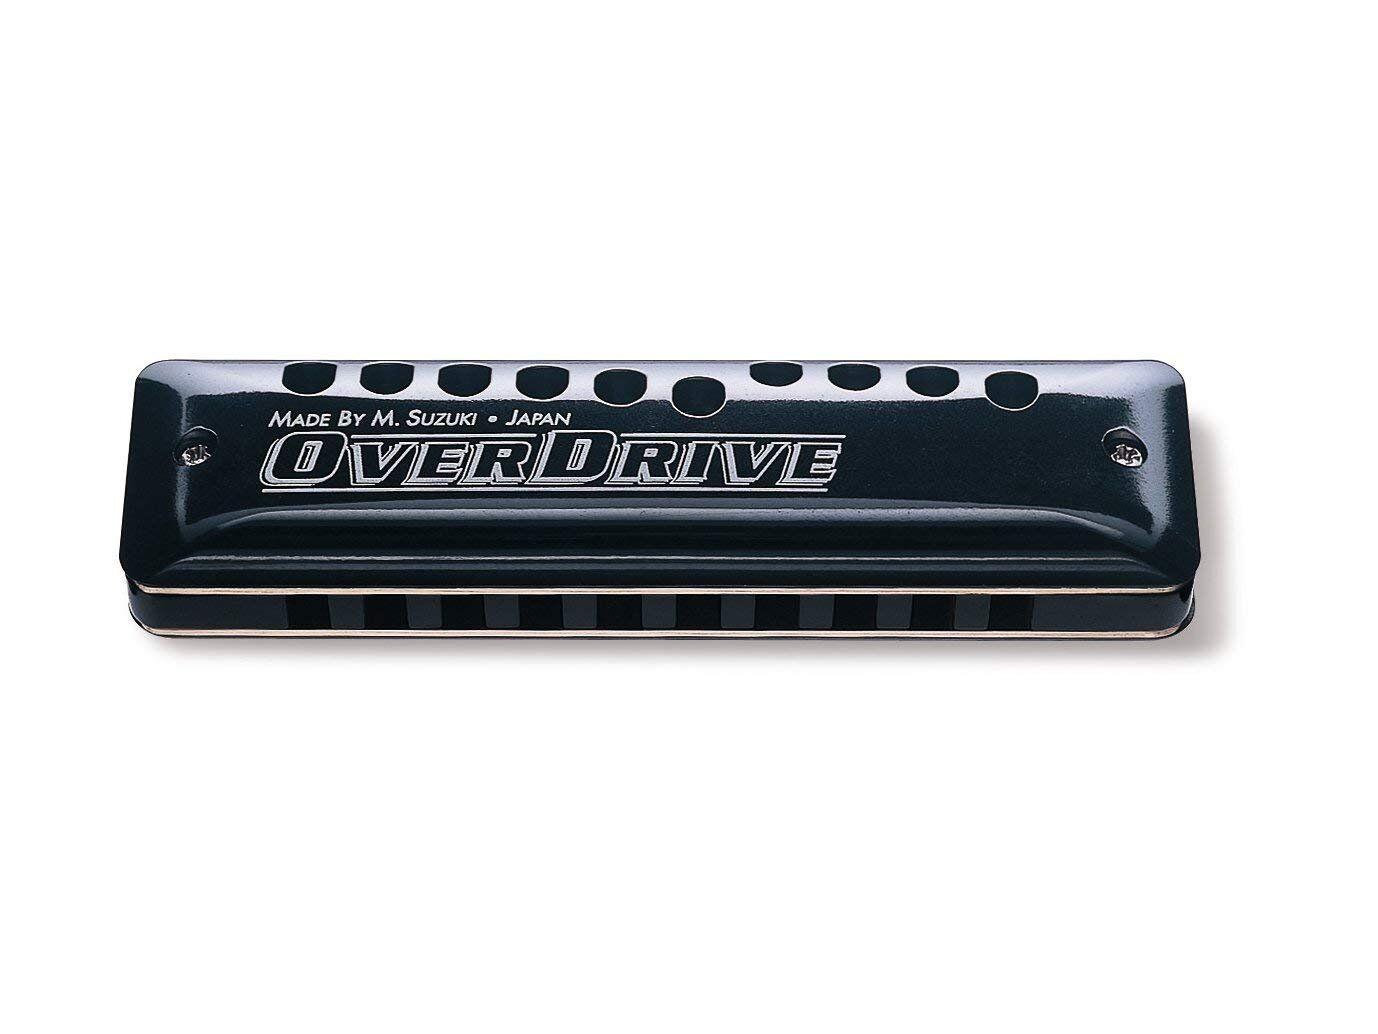 Suzuki MR-300-E Overdrive Deluxe Bendable 10-Hole Diatonic Harmonica, Key of E